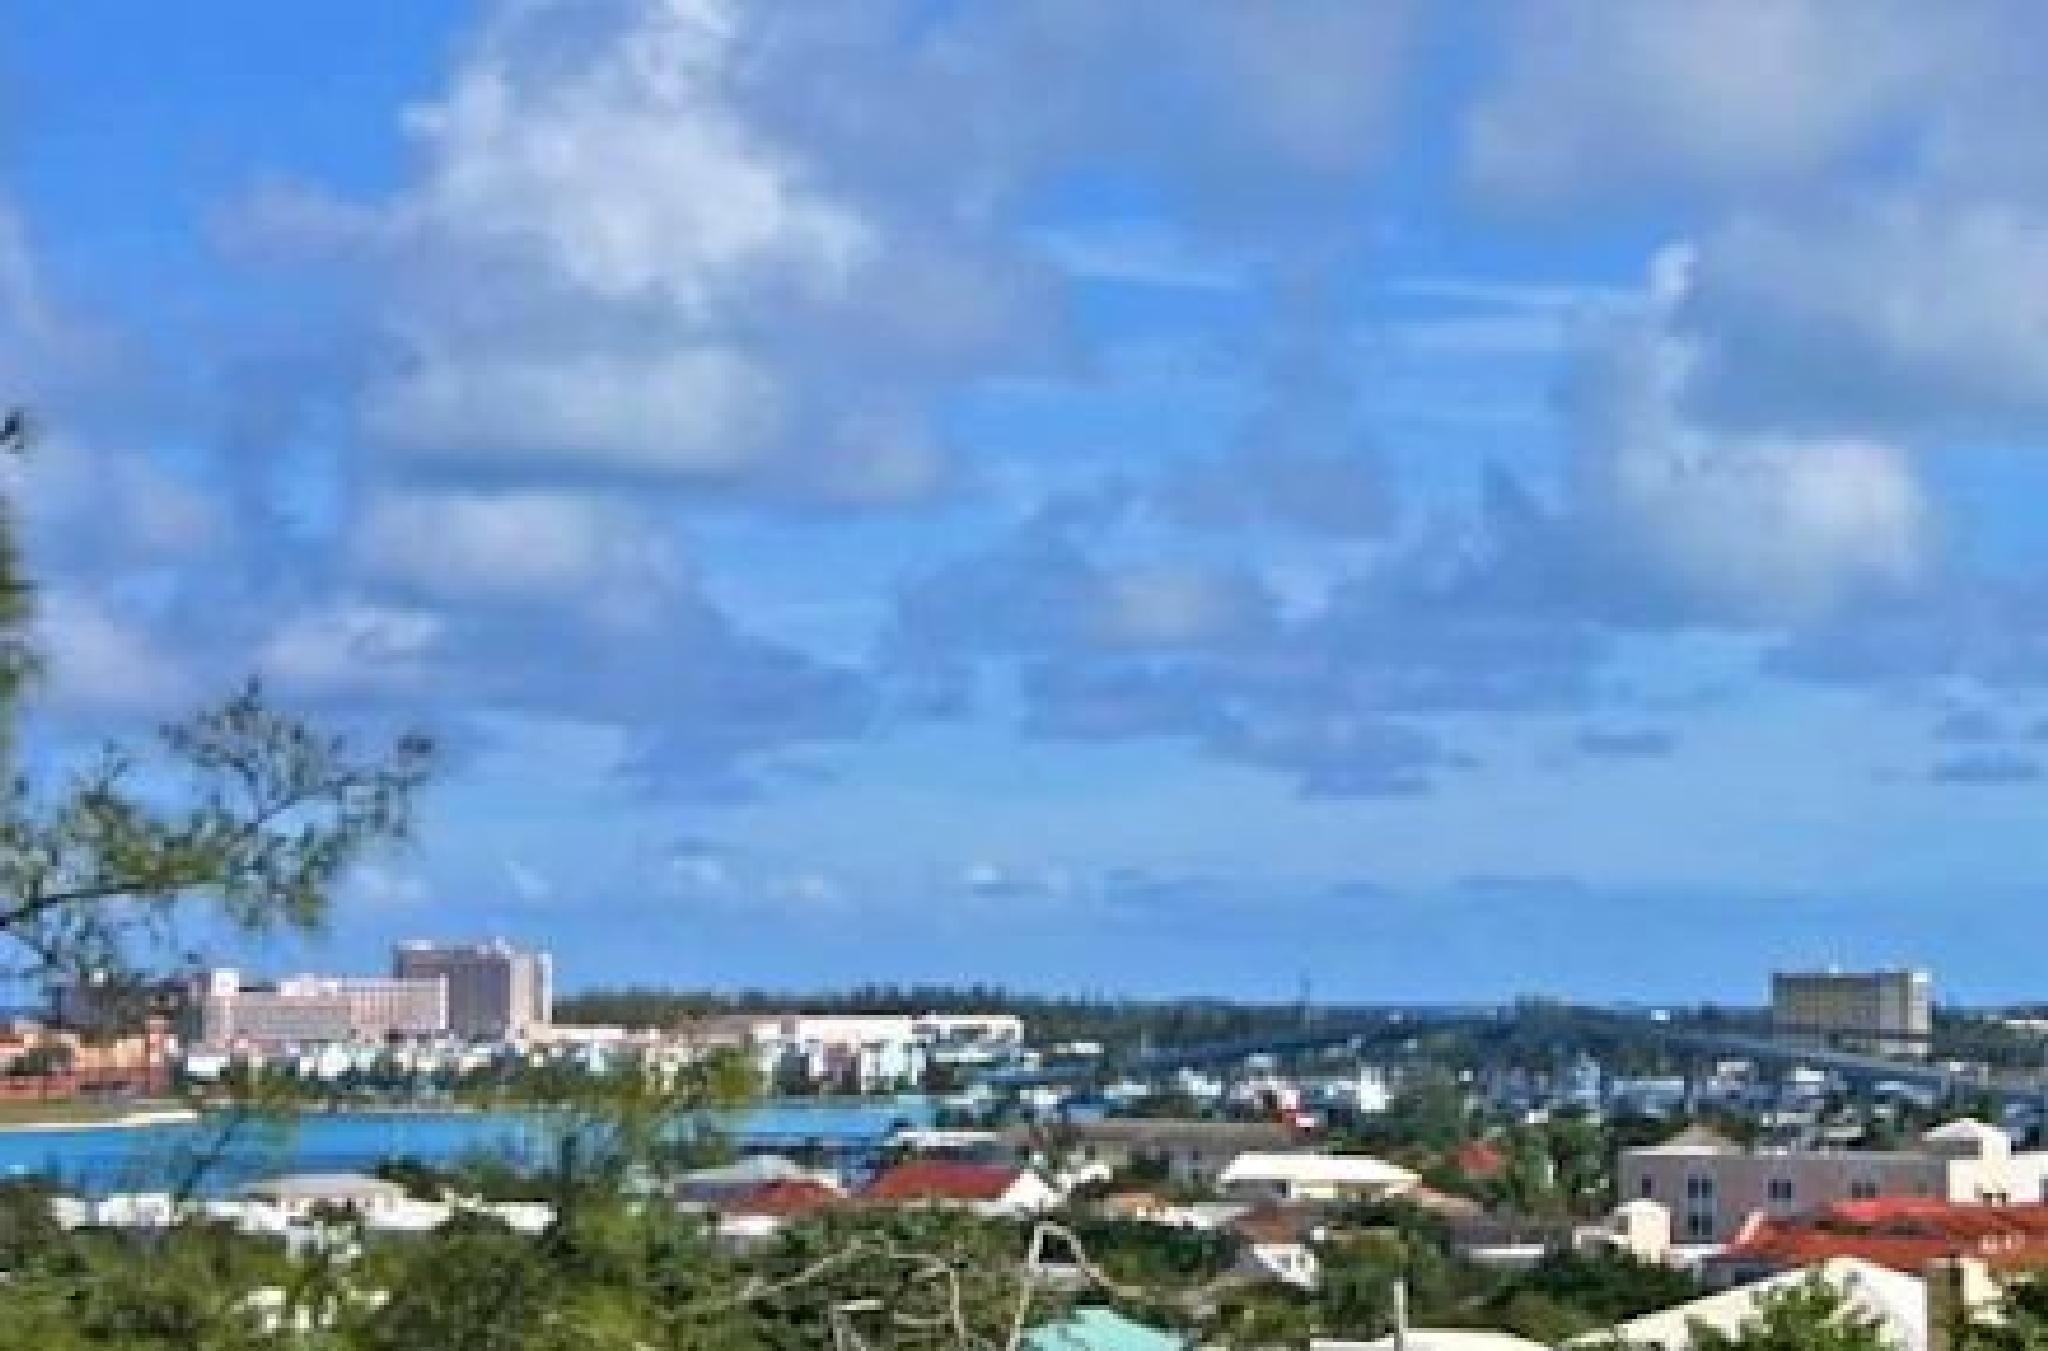 Nassau, Bahamas by dubblybubbly51